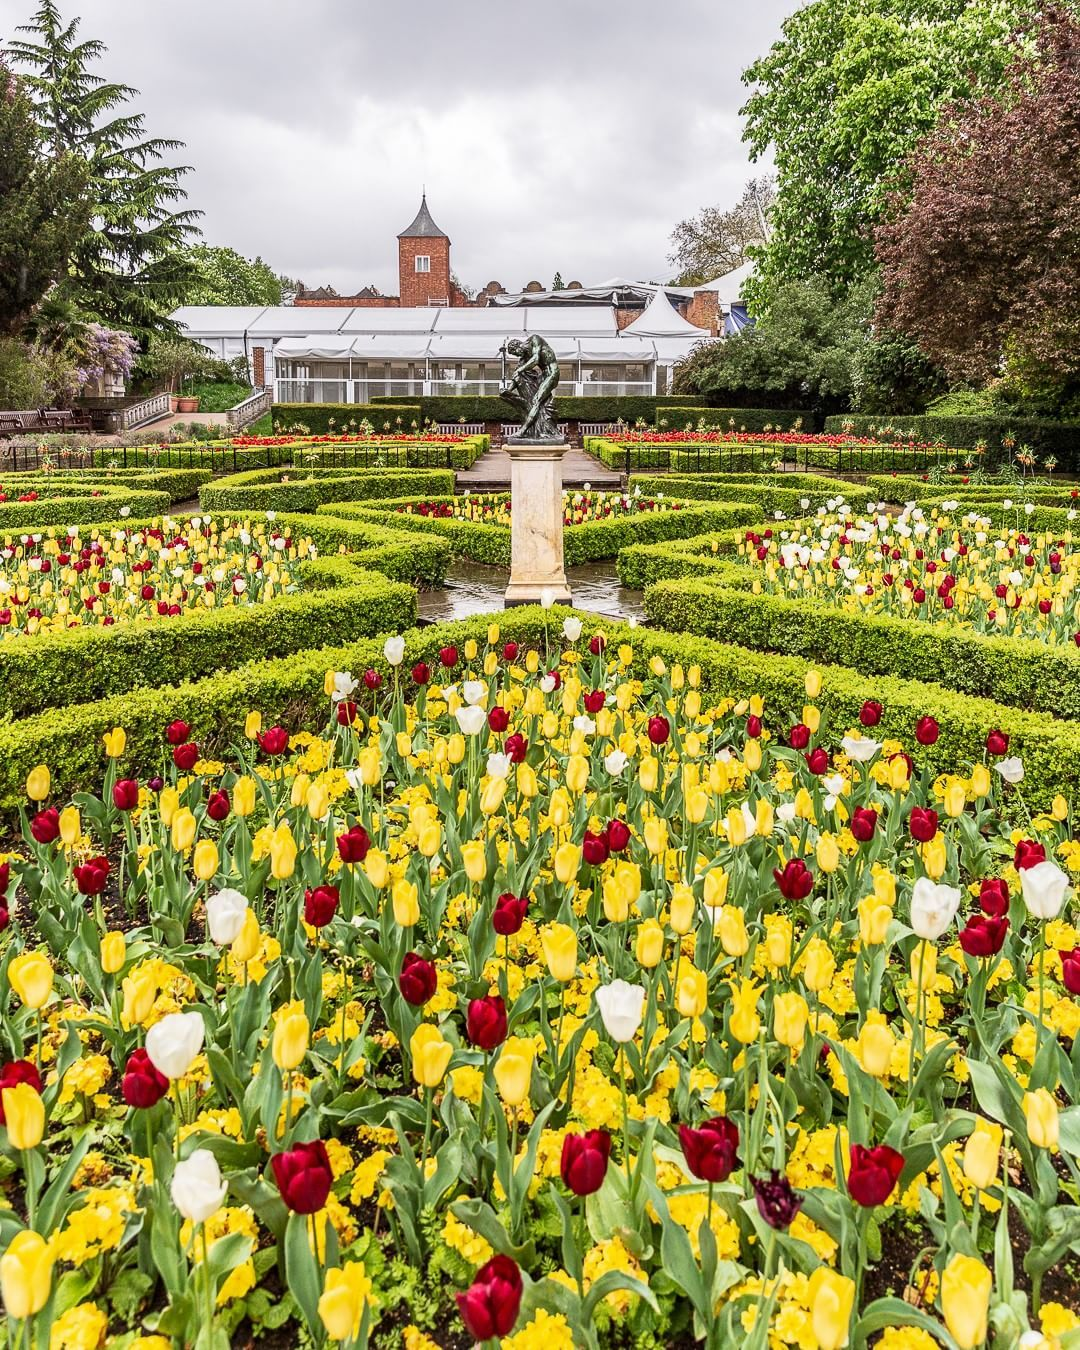 44c59fc6cc82a6fb4daf211d52fa5291 - Best Gardens To Visit In Spring